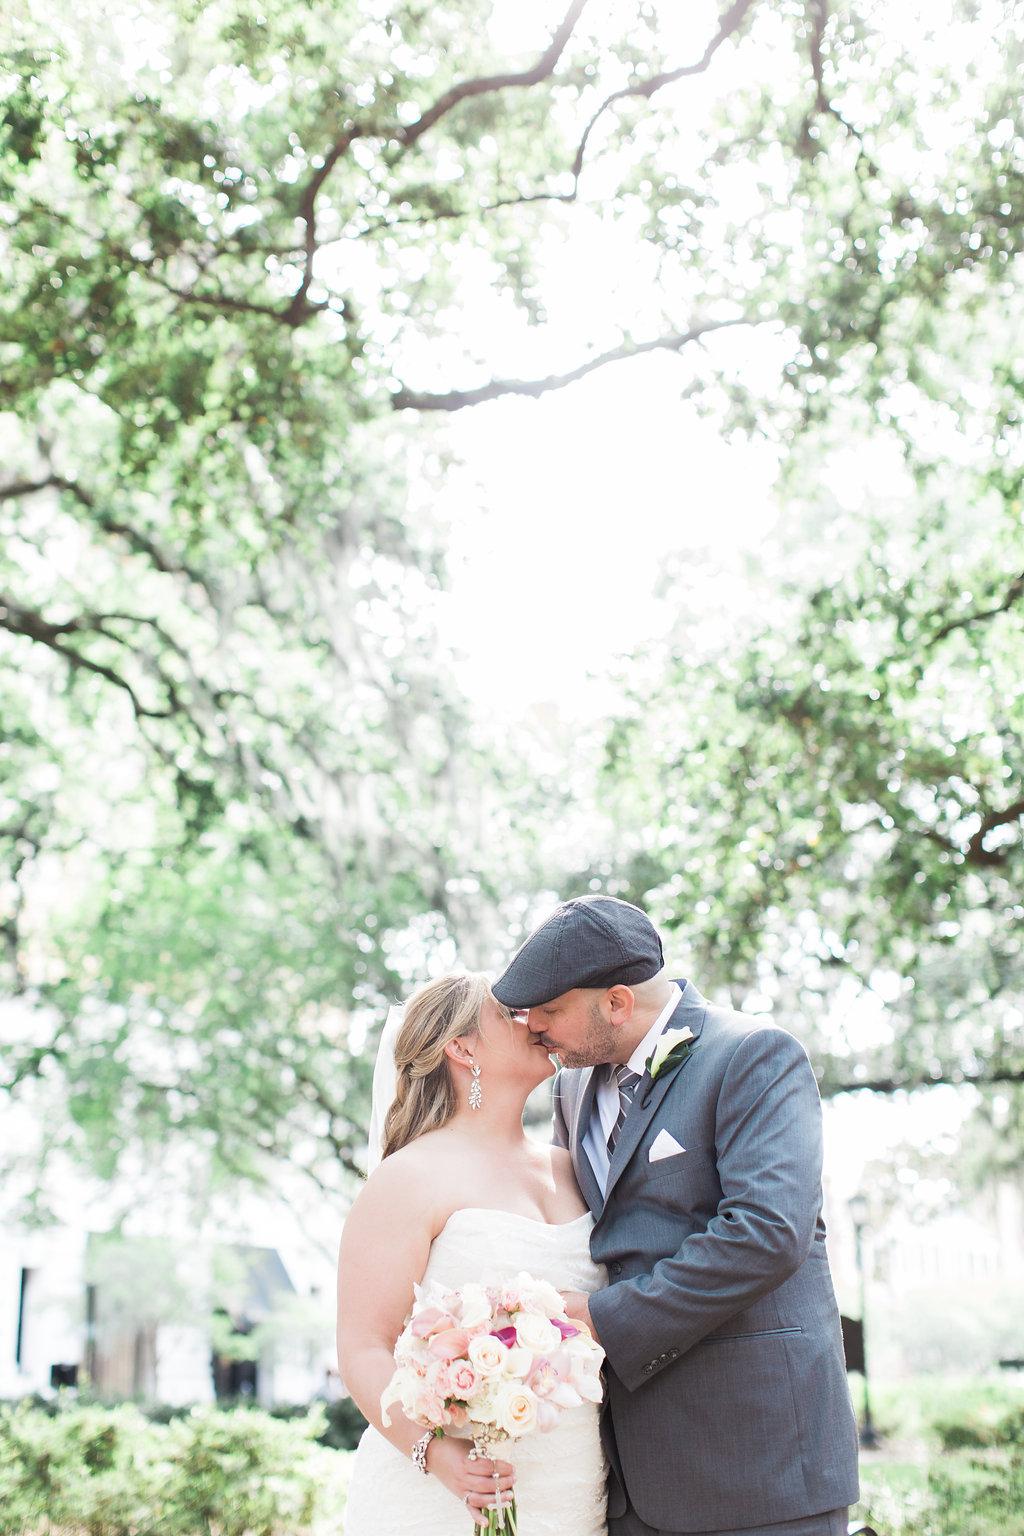 kristin-and-darren-wedding-soho-south-cafe-wormsloe-apt-b-photography-savannah-wedding-planner-savannah-weddings-southern-weddings-best-savannah-wedding-planner-17.JPG